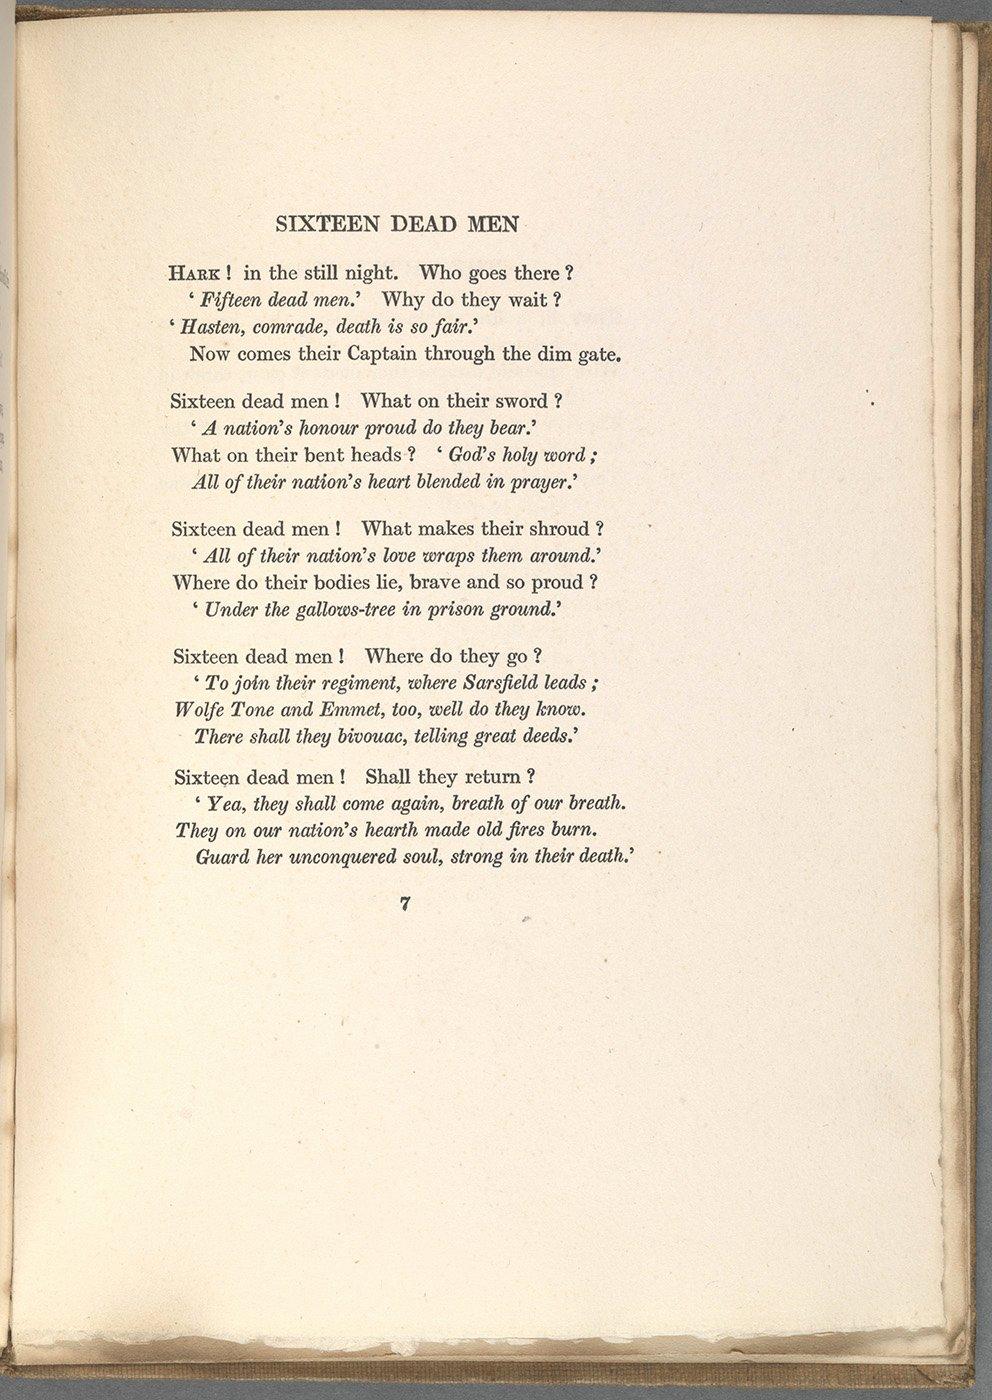 Love Poems Of Great Men Unique Sixteen Dead Men – Changed Utterly